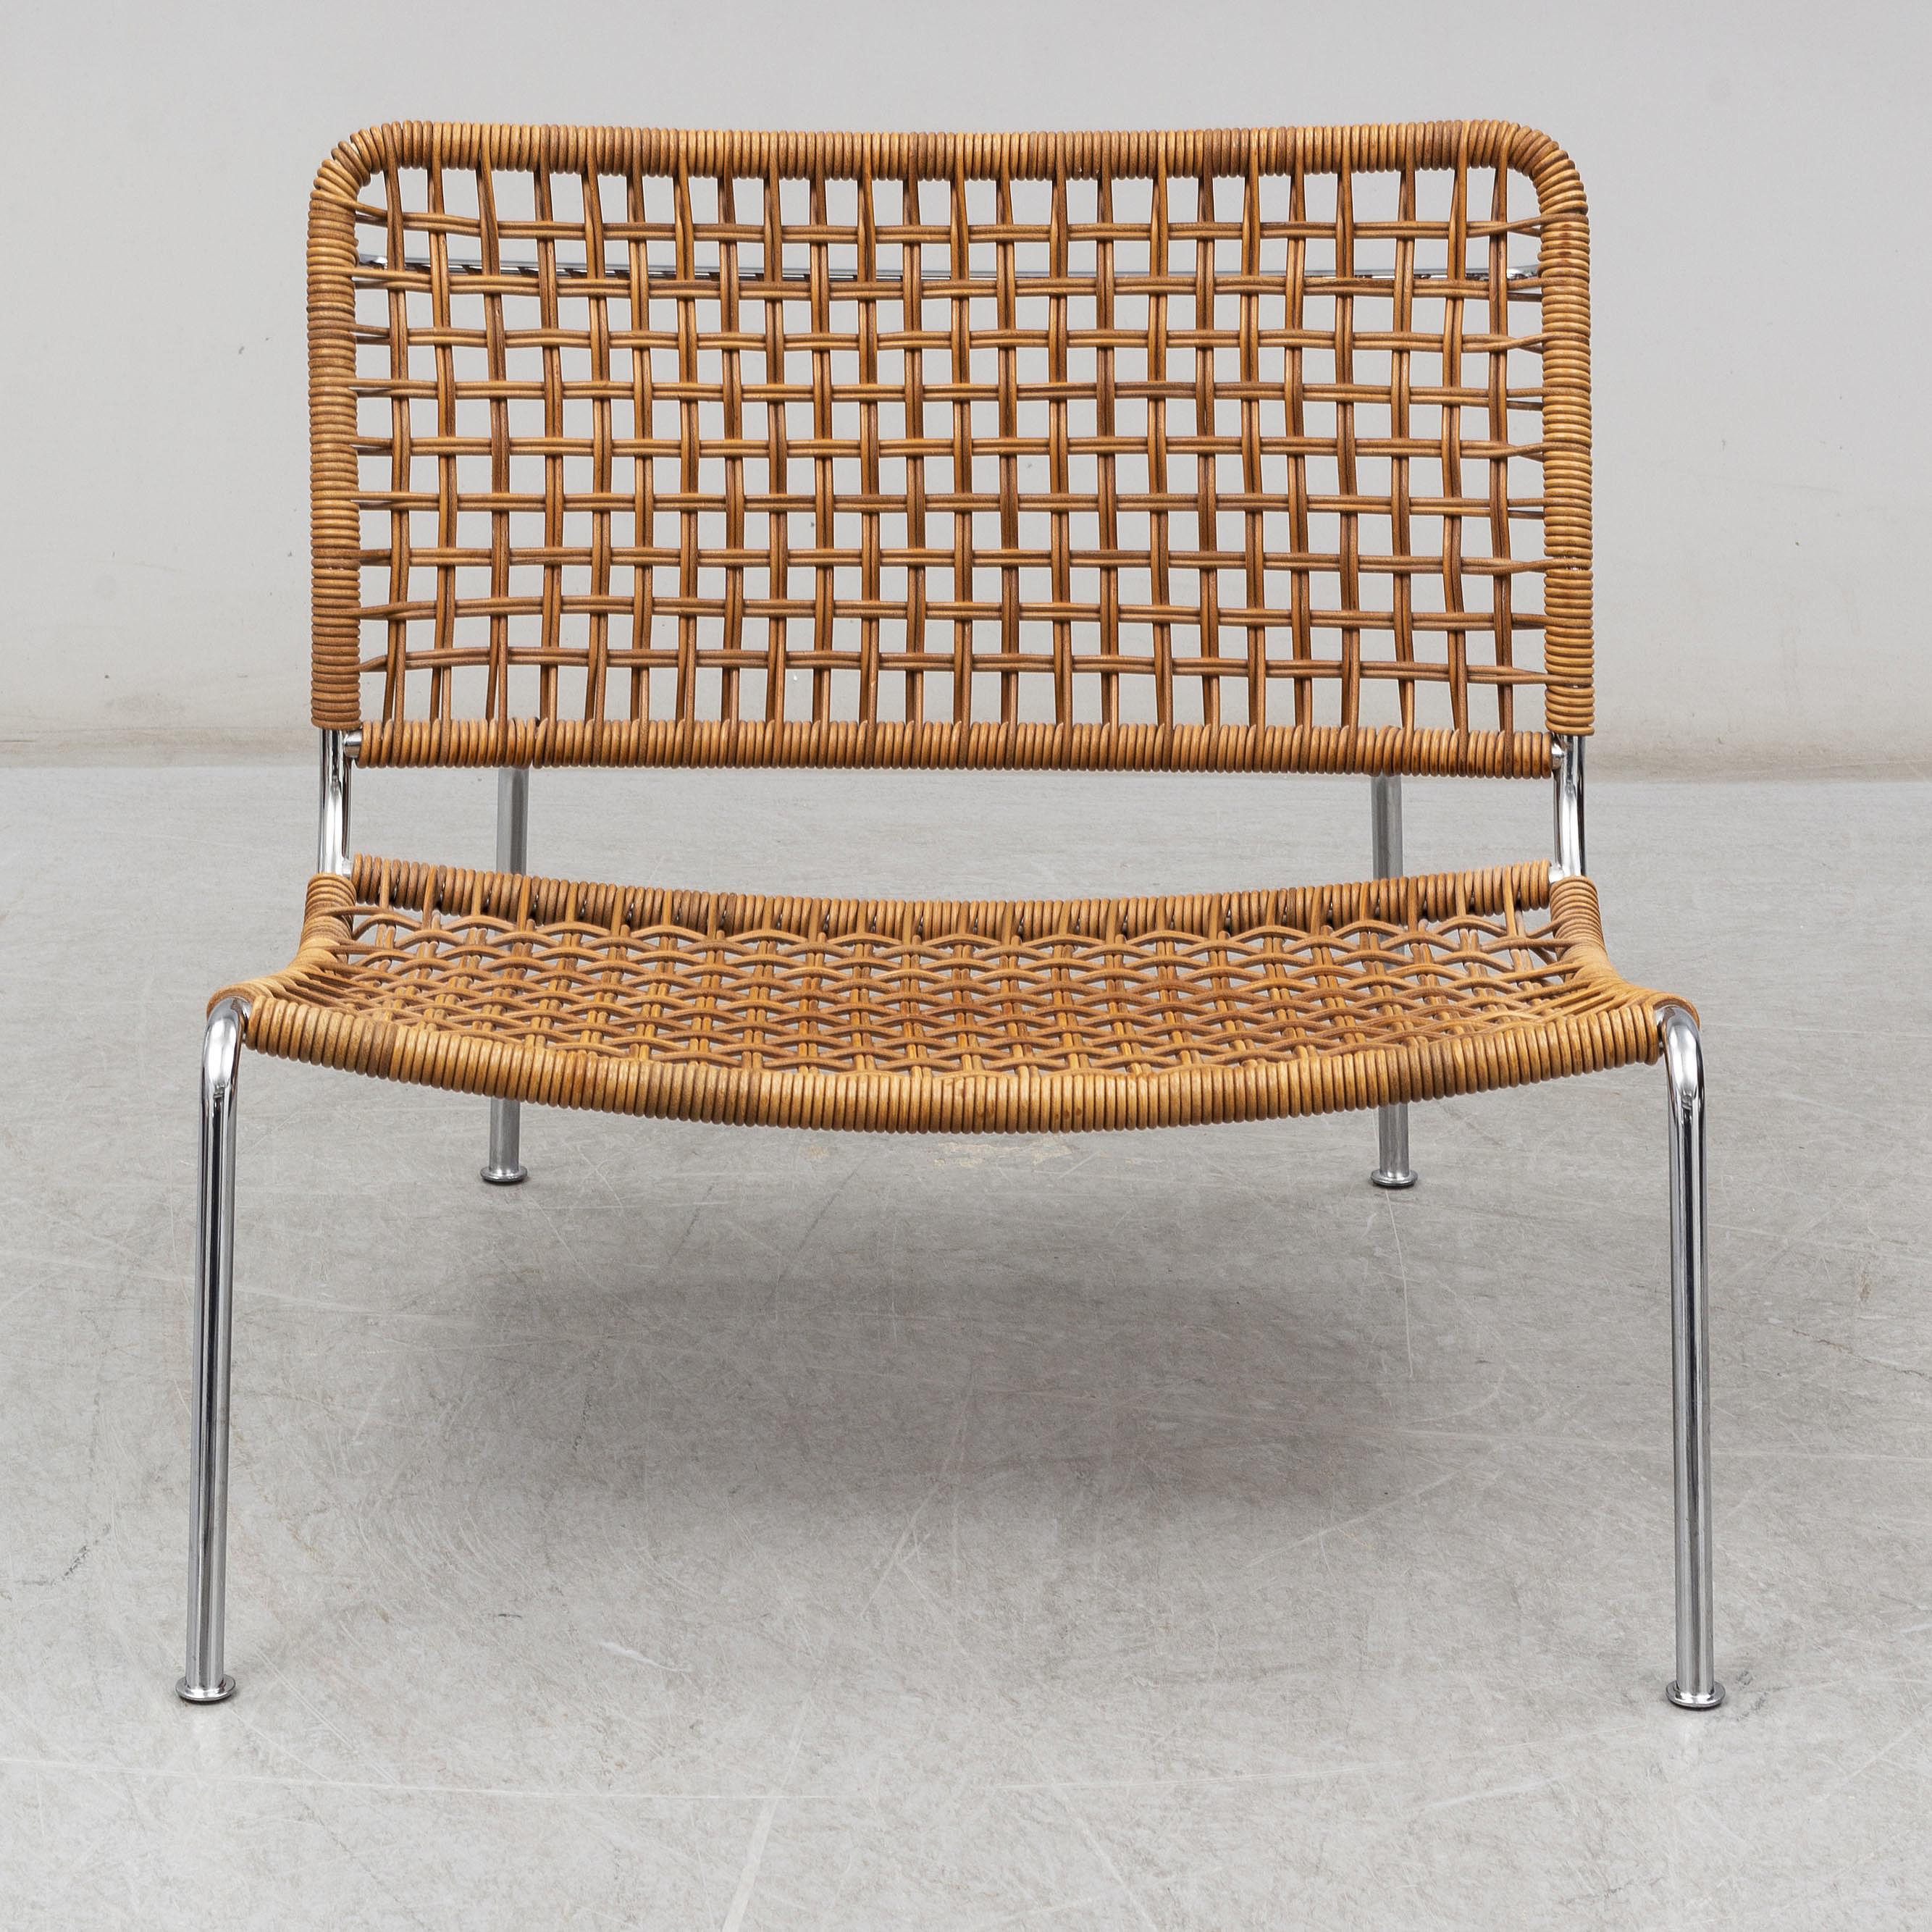 Piero Lissoni A Frog Lounge Easy Chair Living Divani Bukowskis